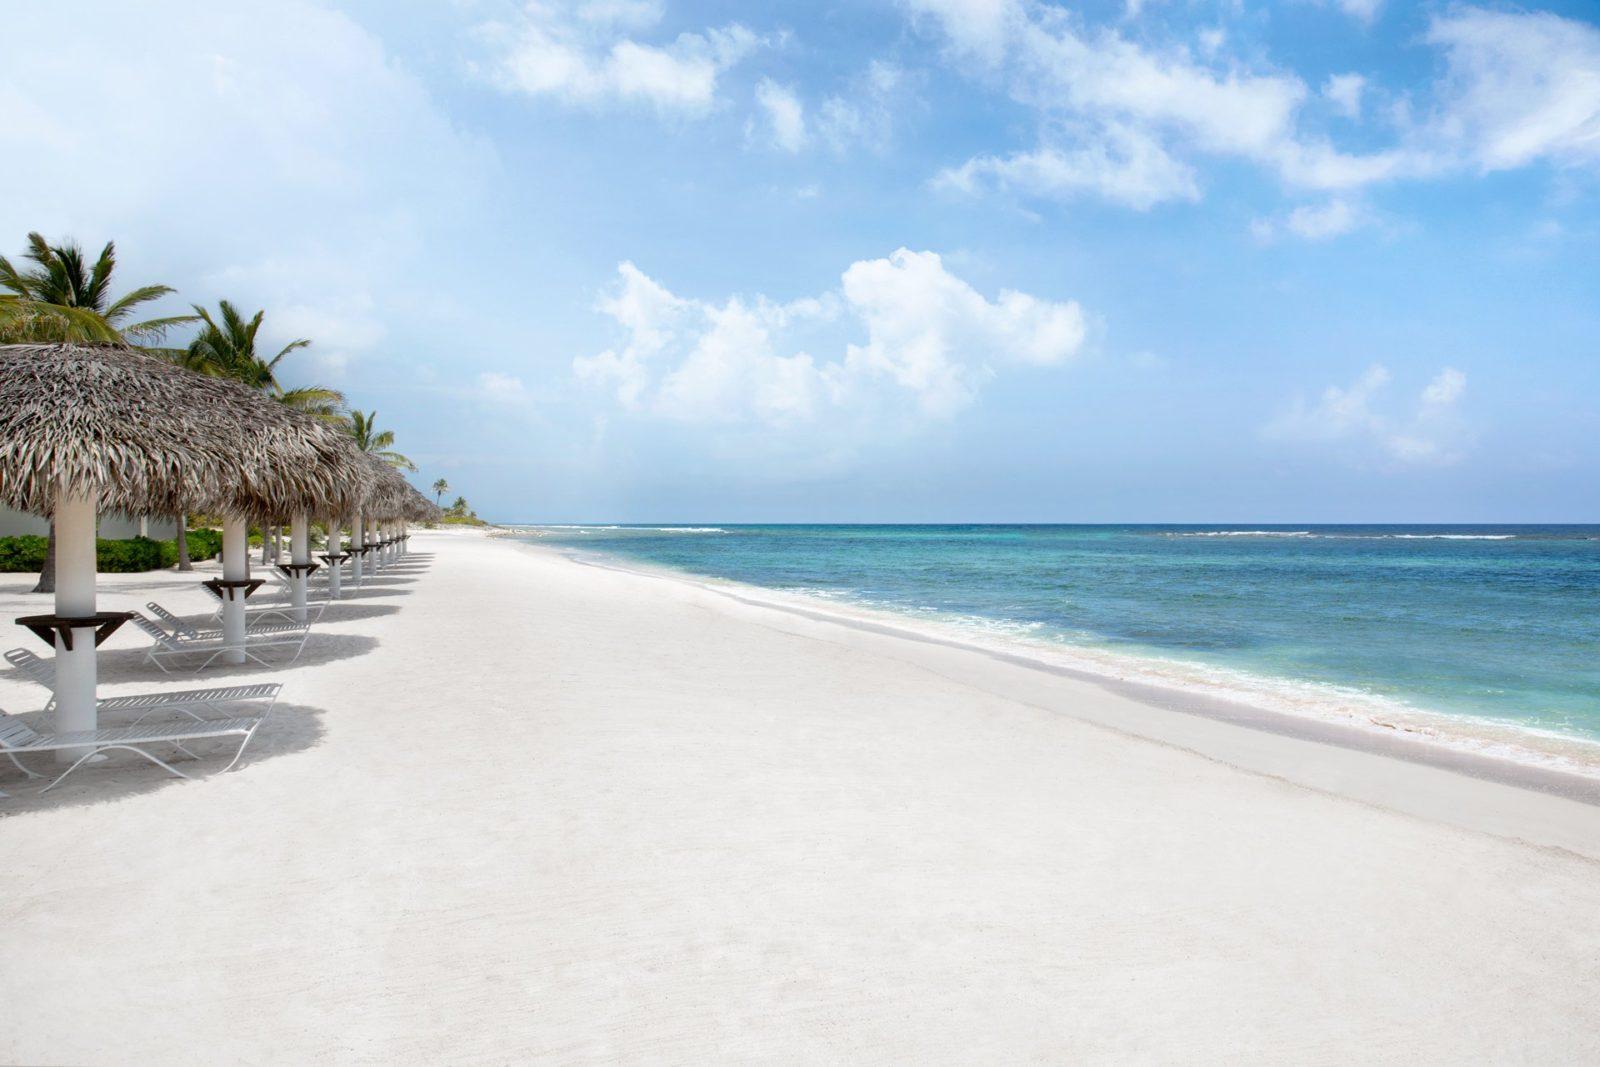 пляжСевен-Майл-Бич на Каймановых островах